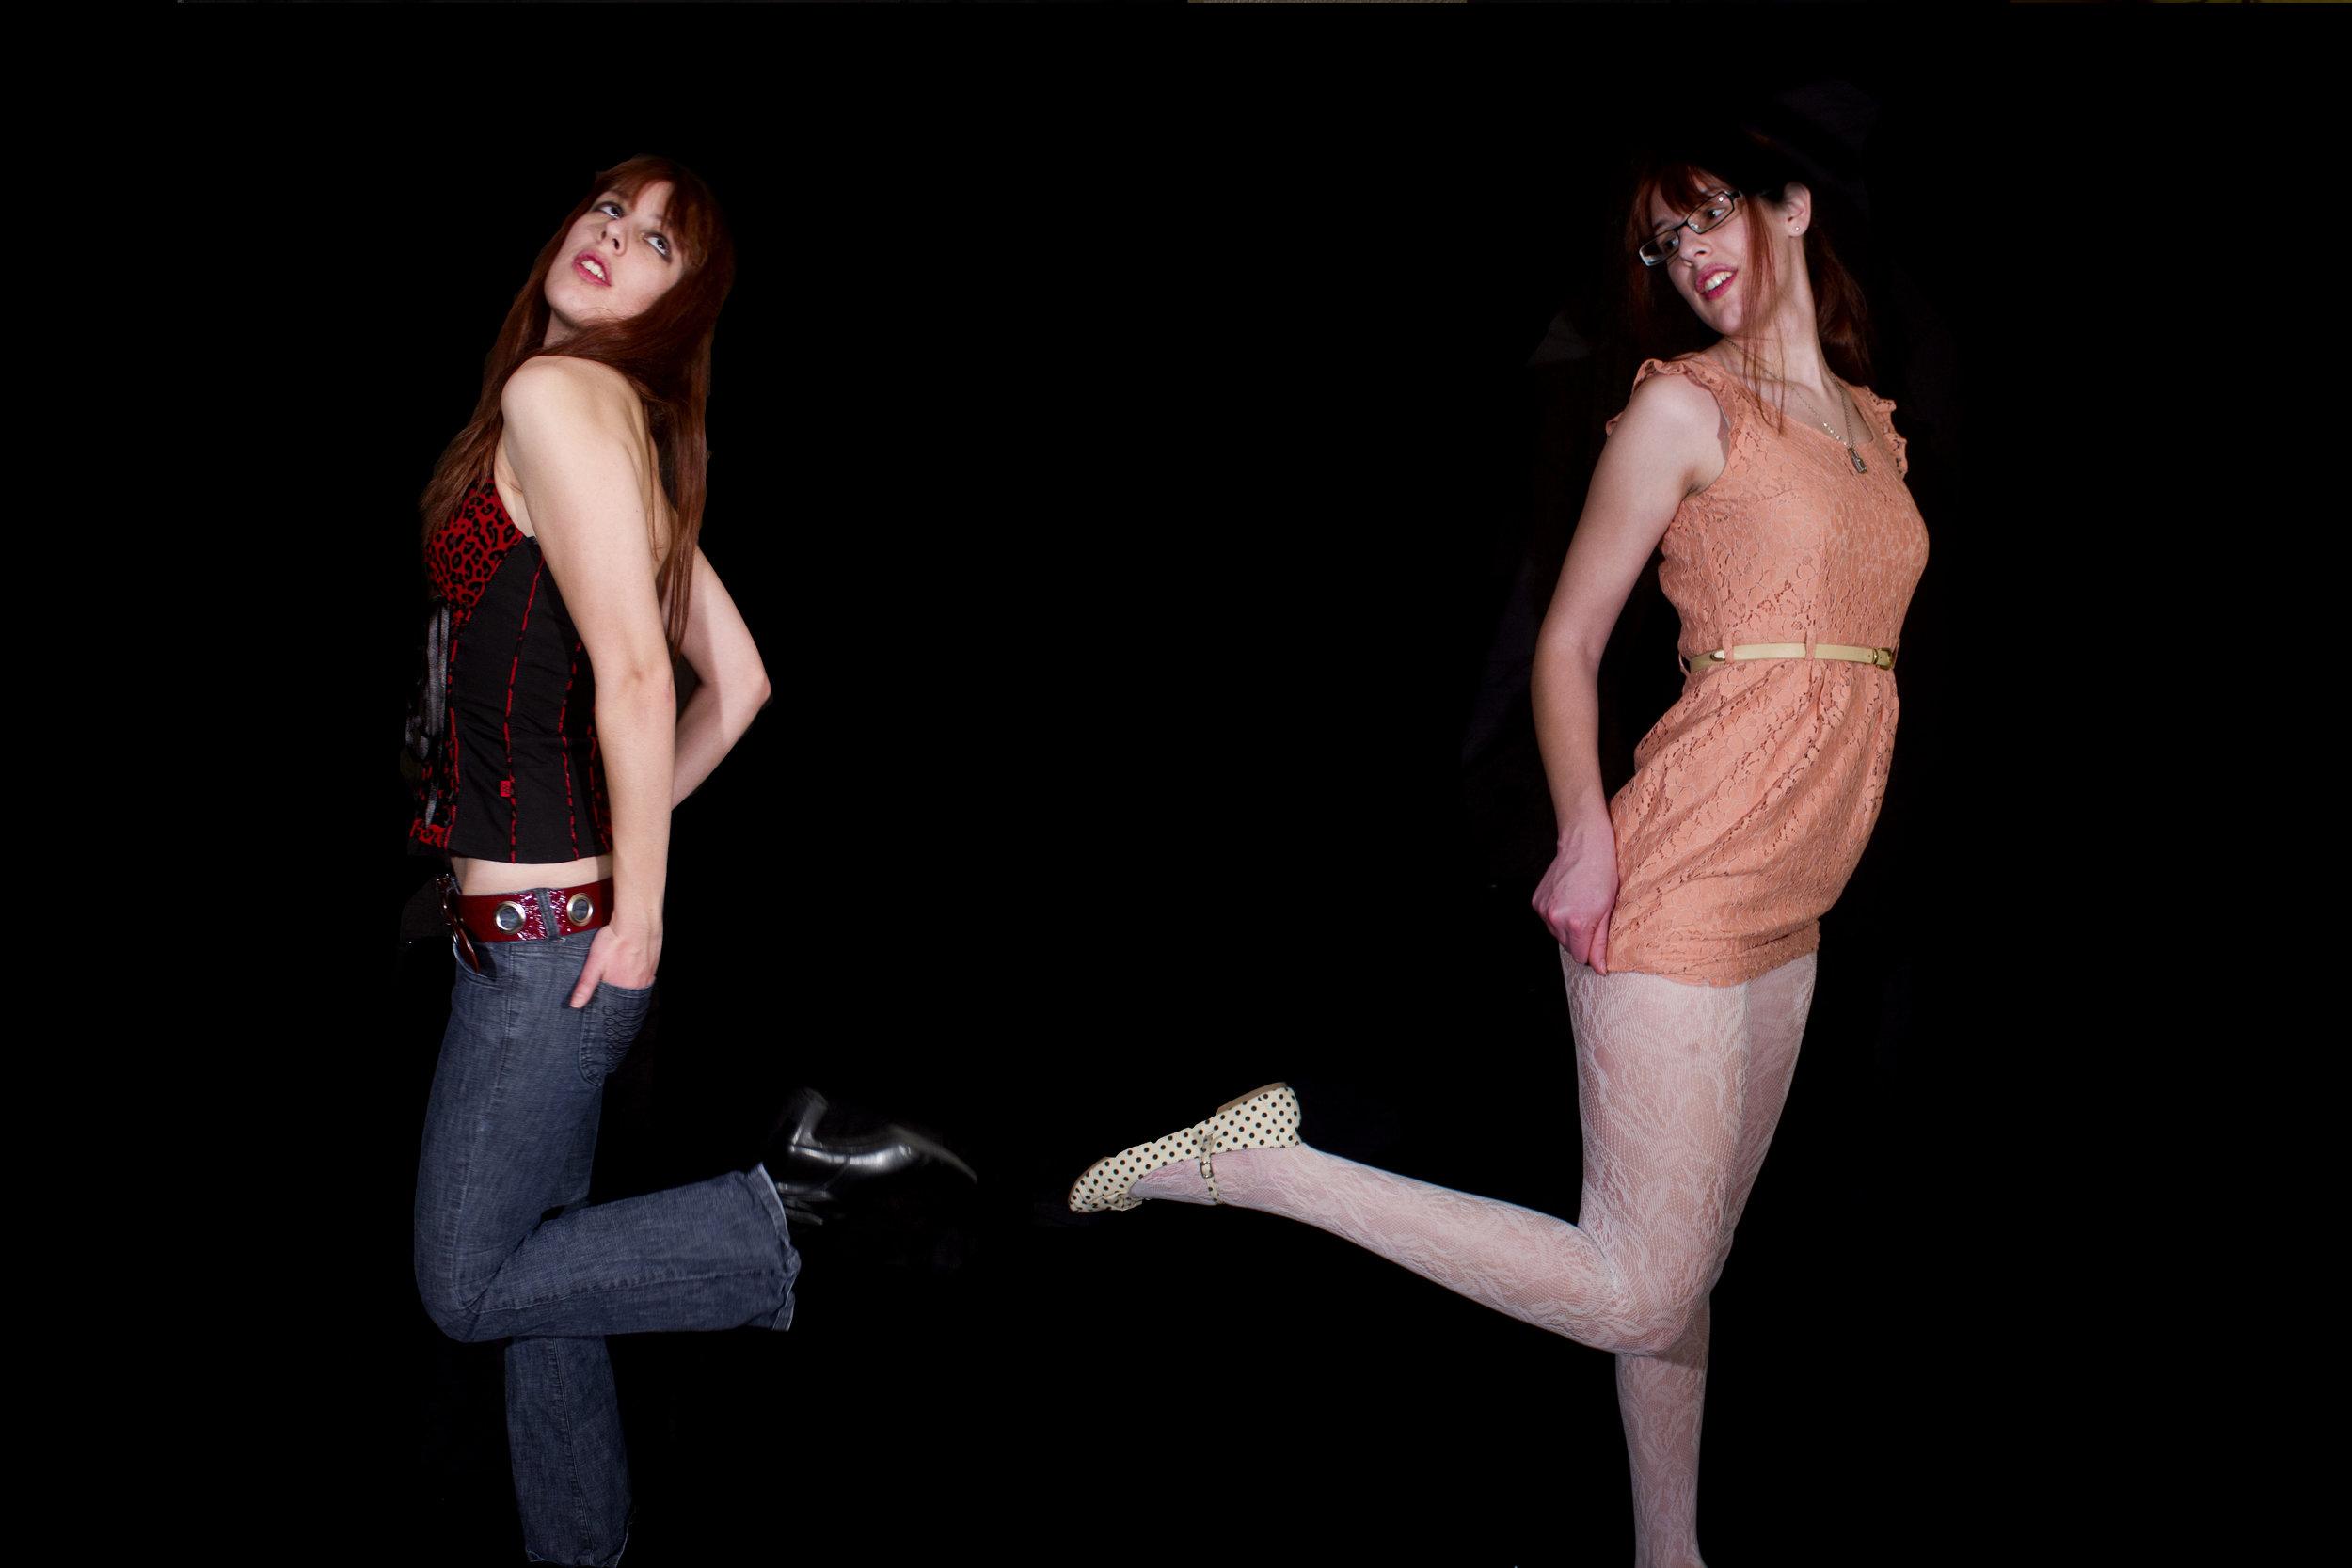 Twins-13.jpg